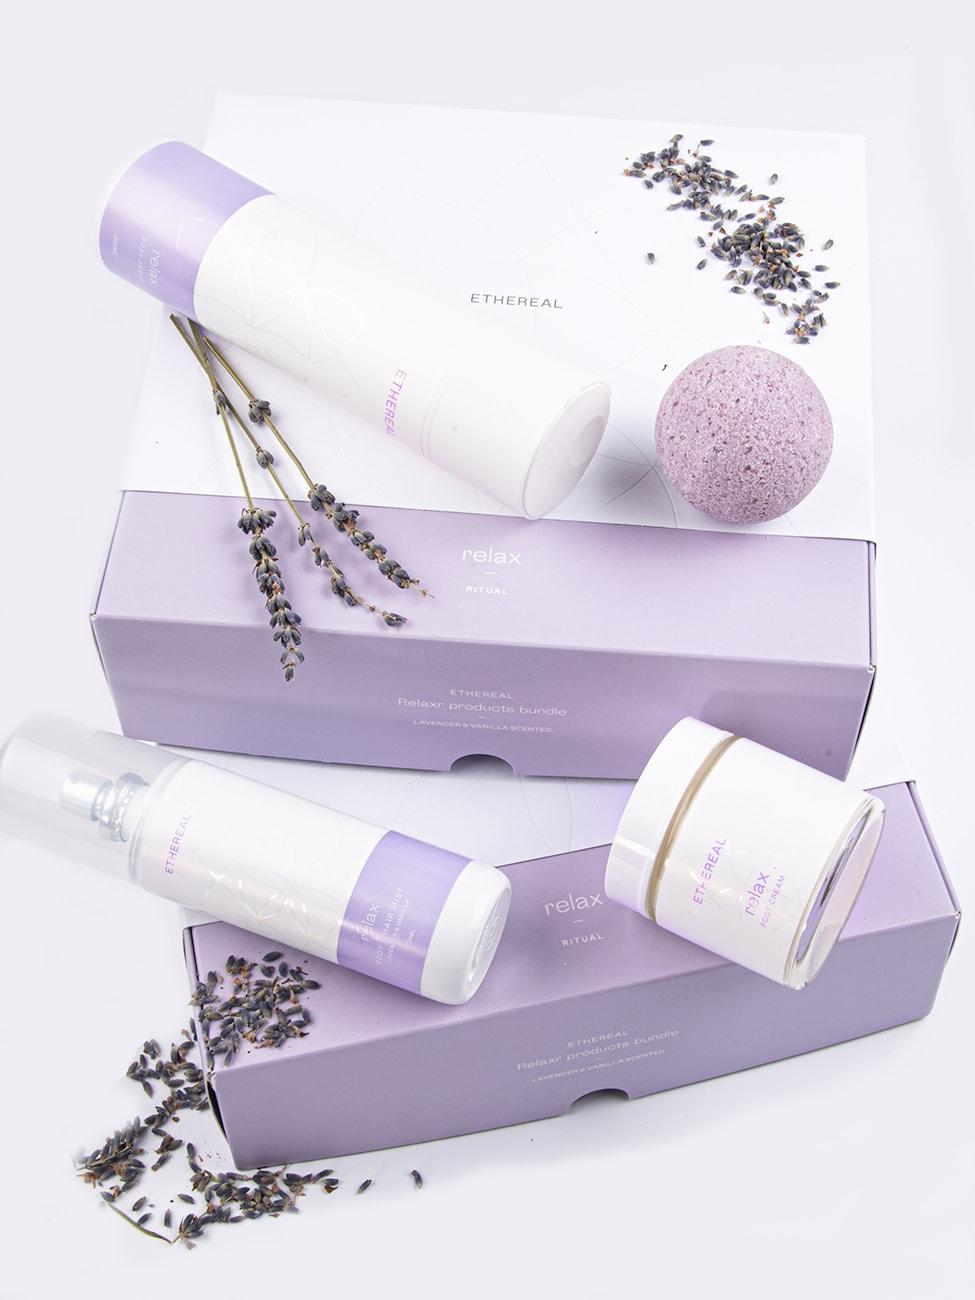 Bundle_Relax_comp_Ethereal_Dermocosmetics_Skincare_Handmade_Greek_Products